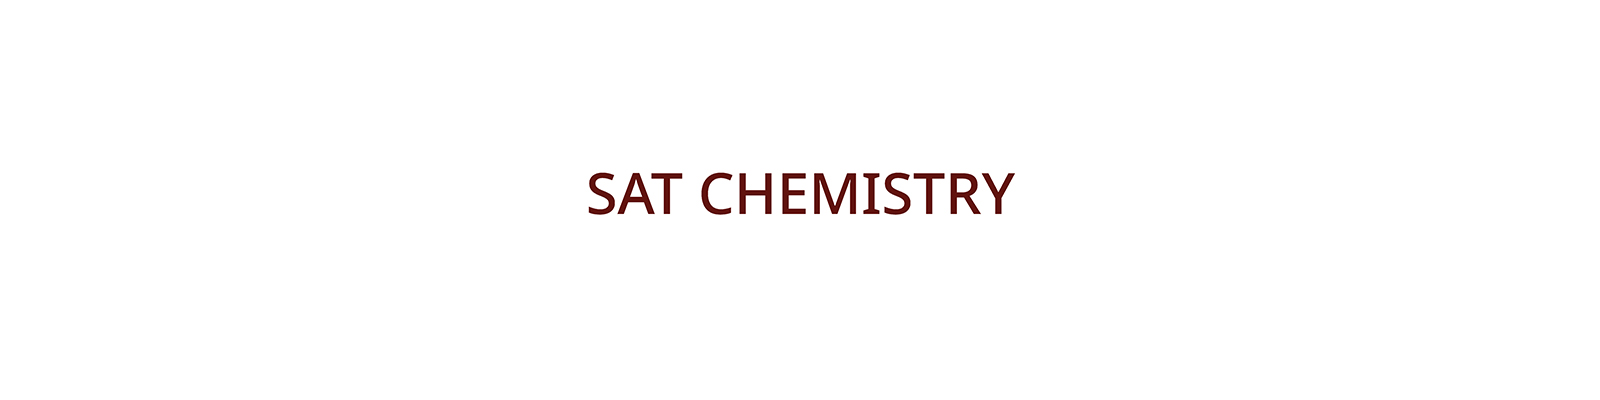 sat-chemistry